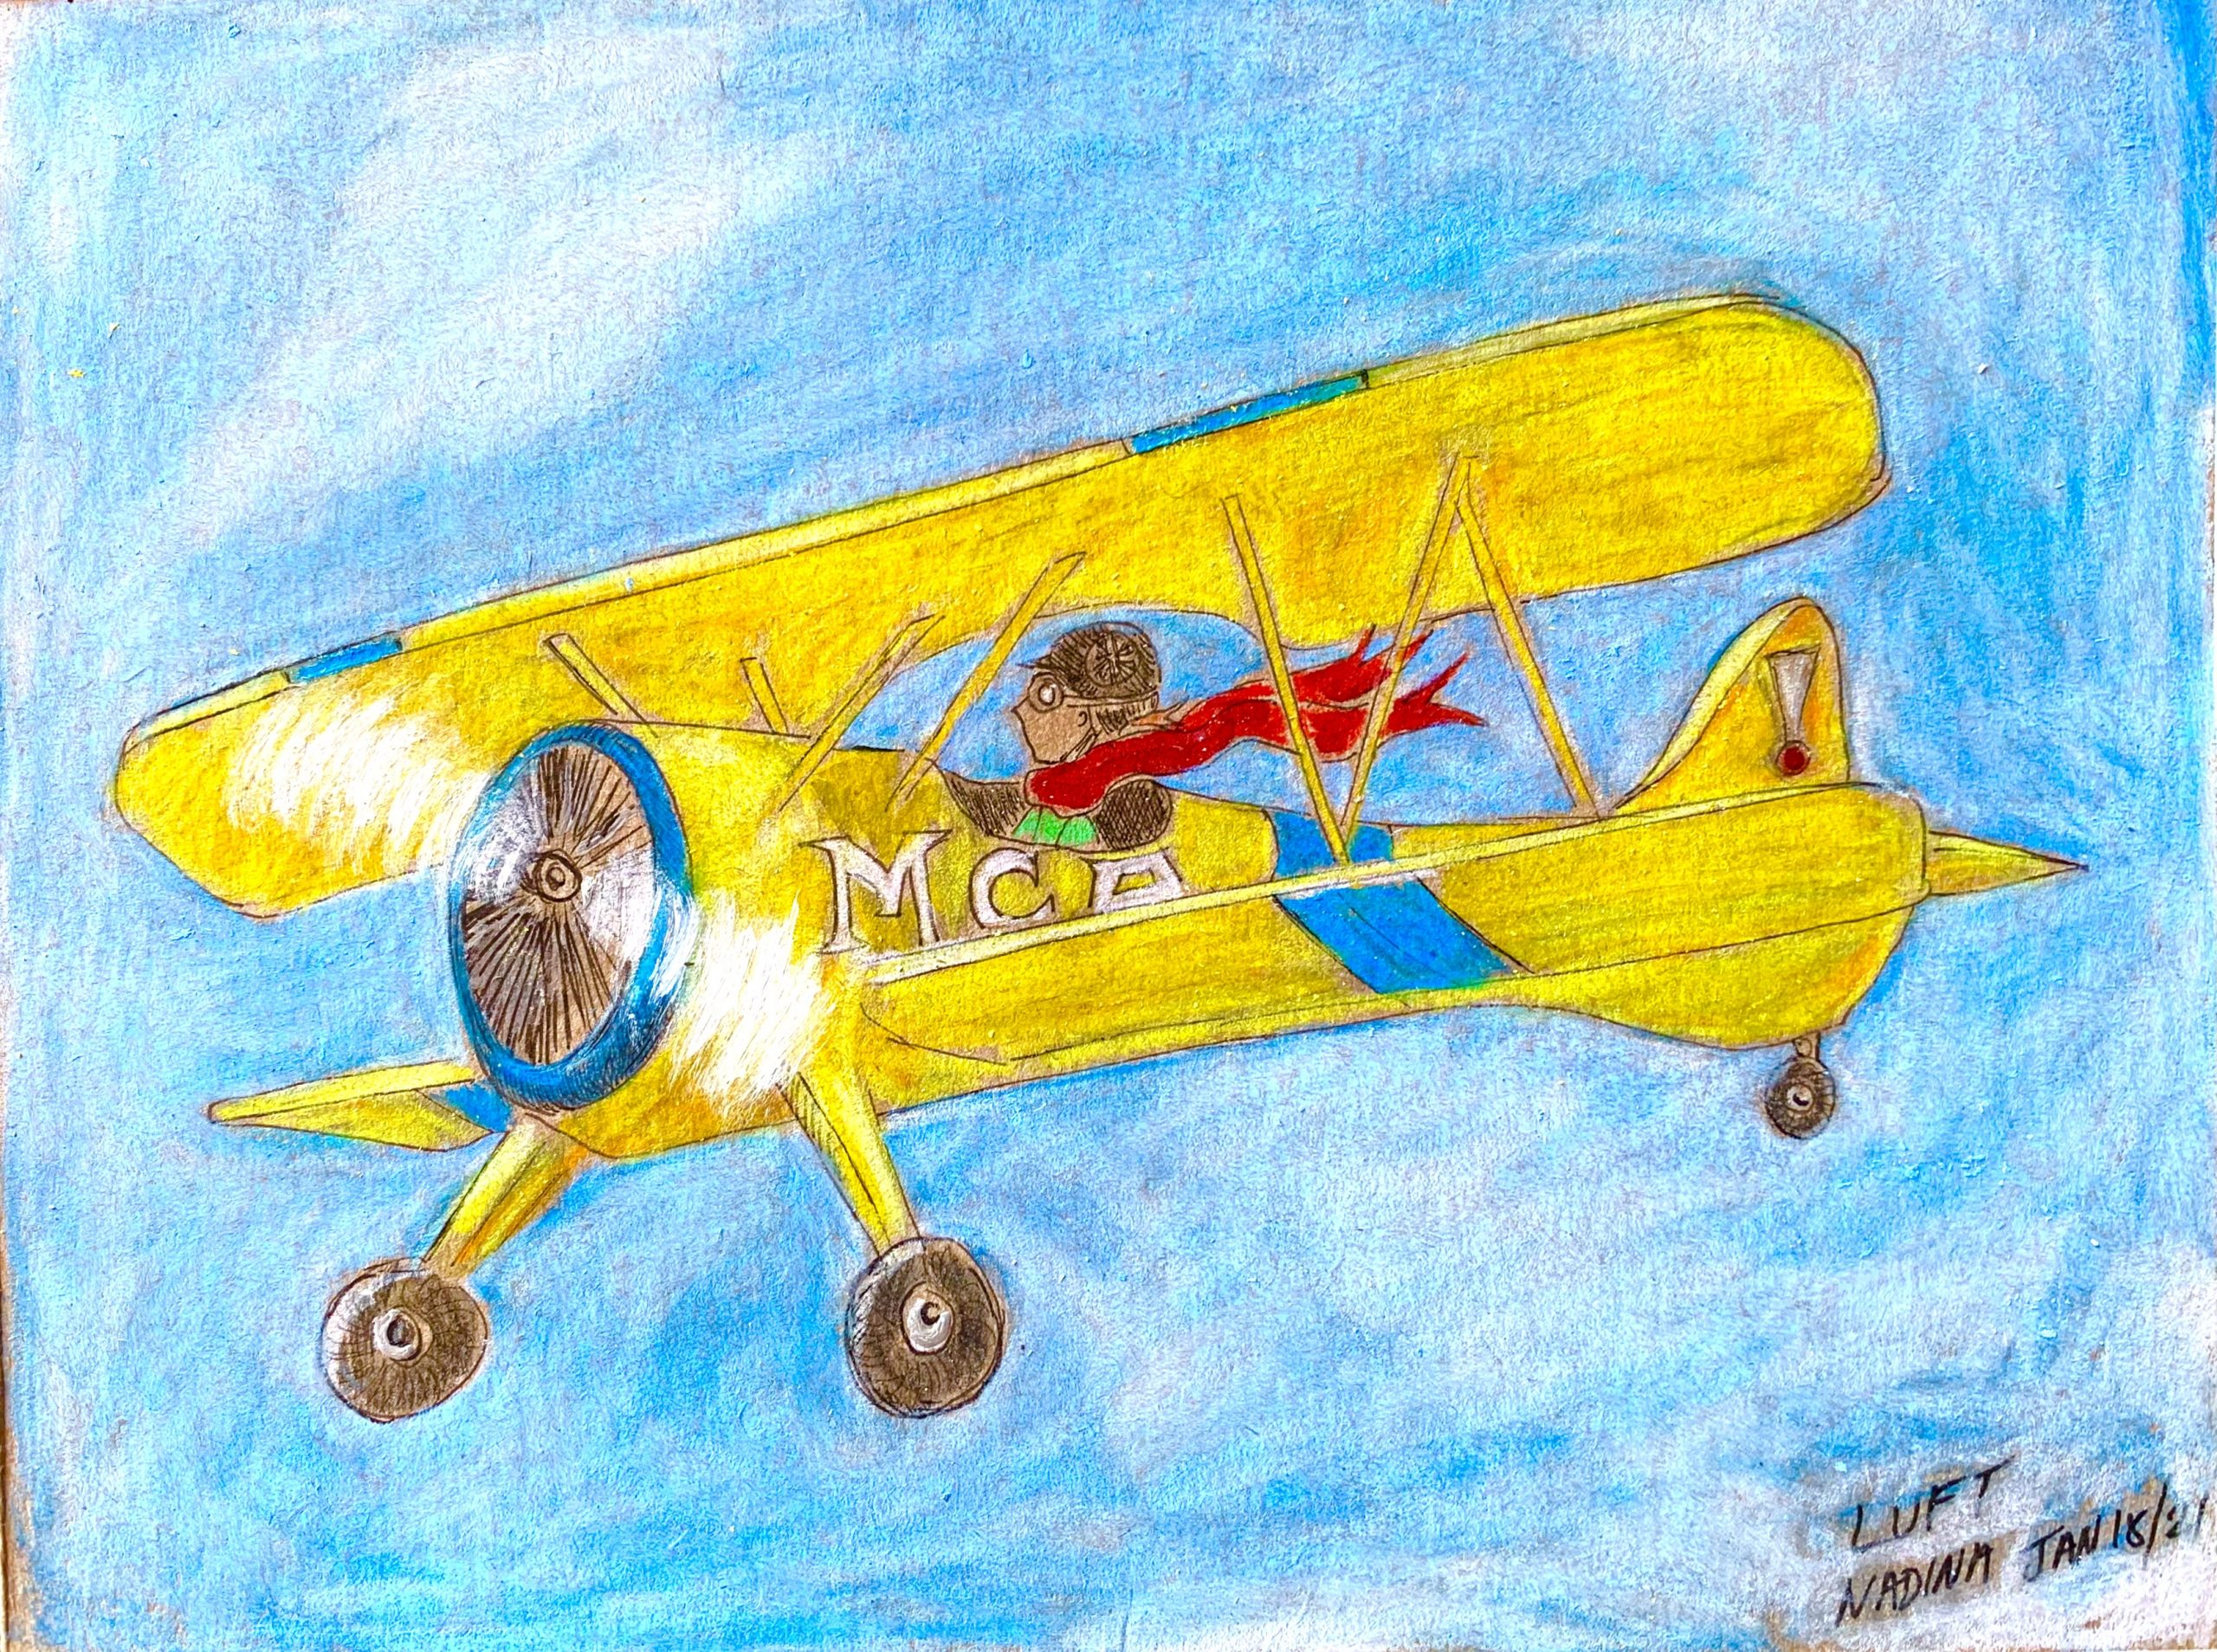 Bi-plane, flight factors, bassoon reed